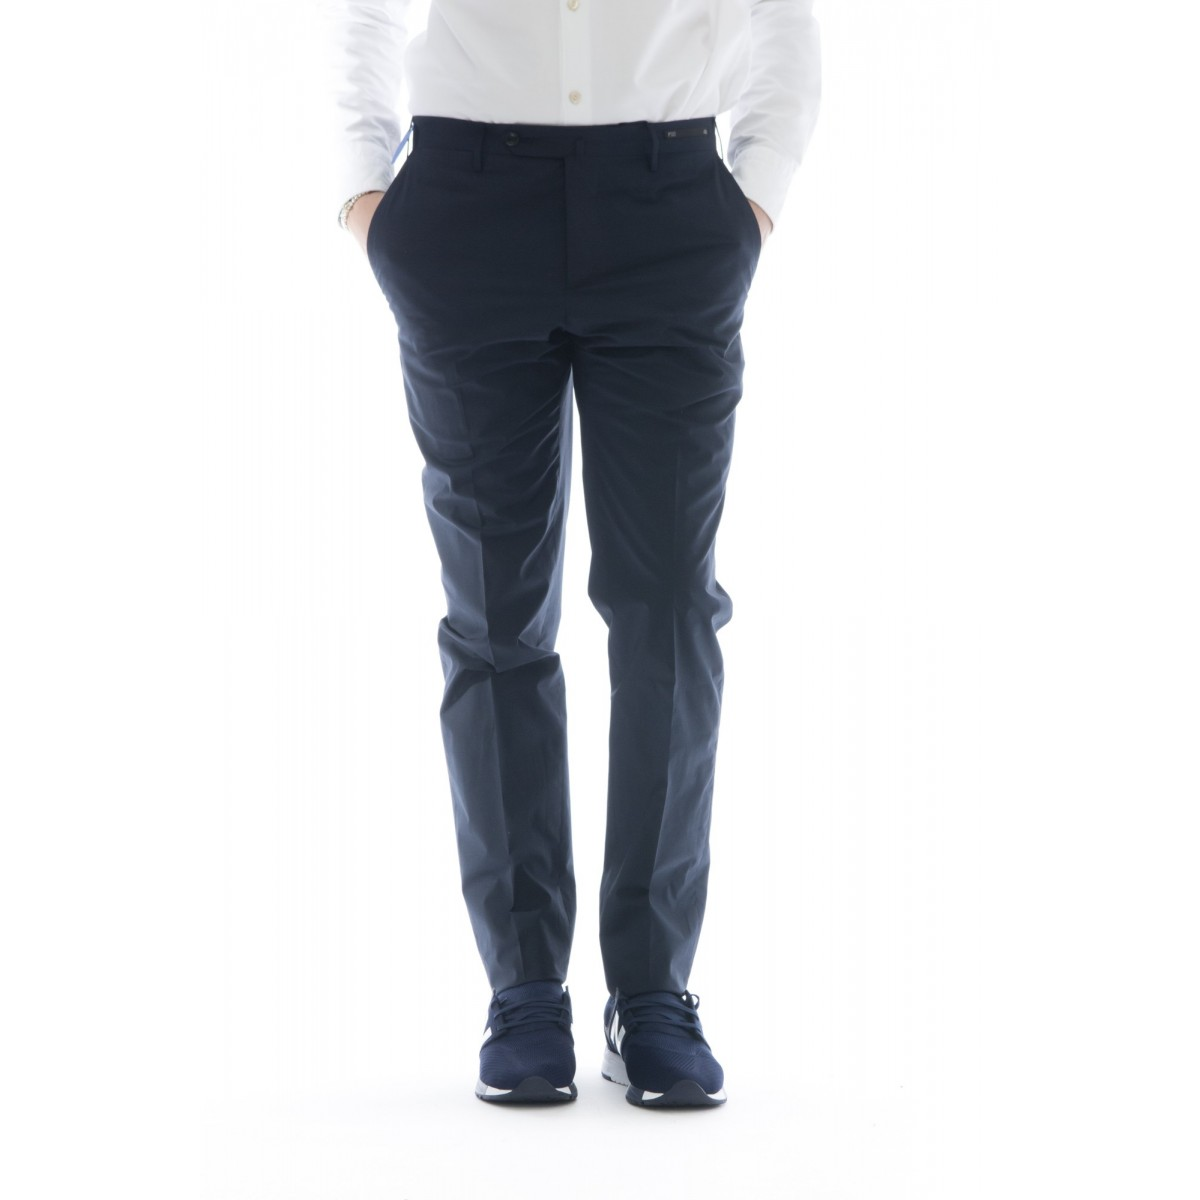 Pantalone uomo - Pt05 mp26